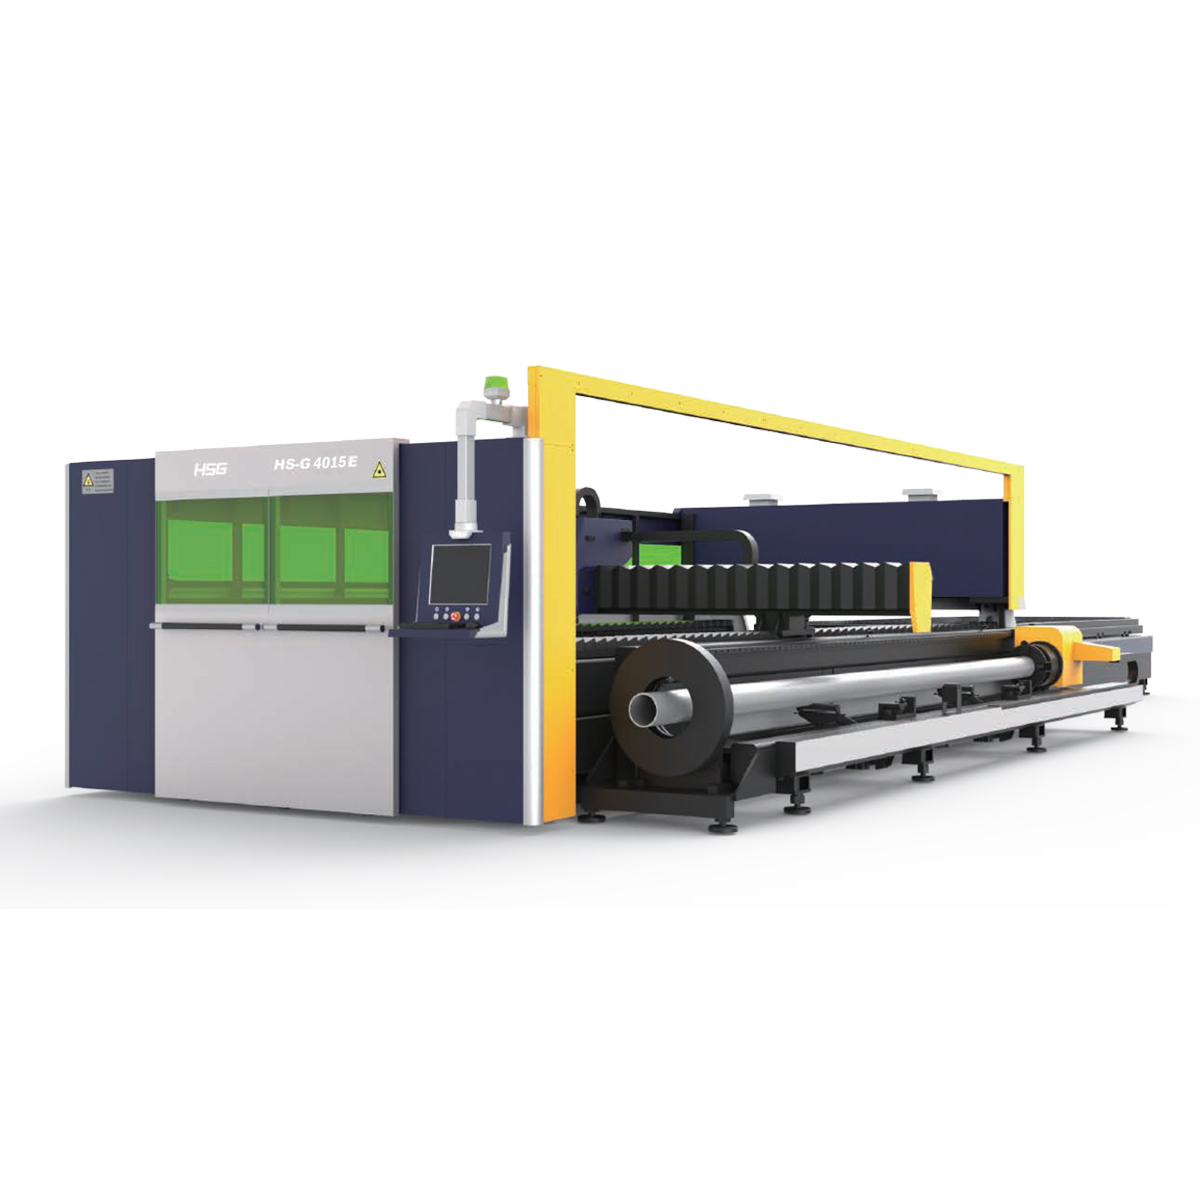 HSG: G4015E Cutting Metal Sheet and Tube